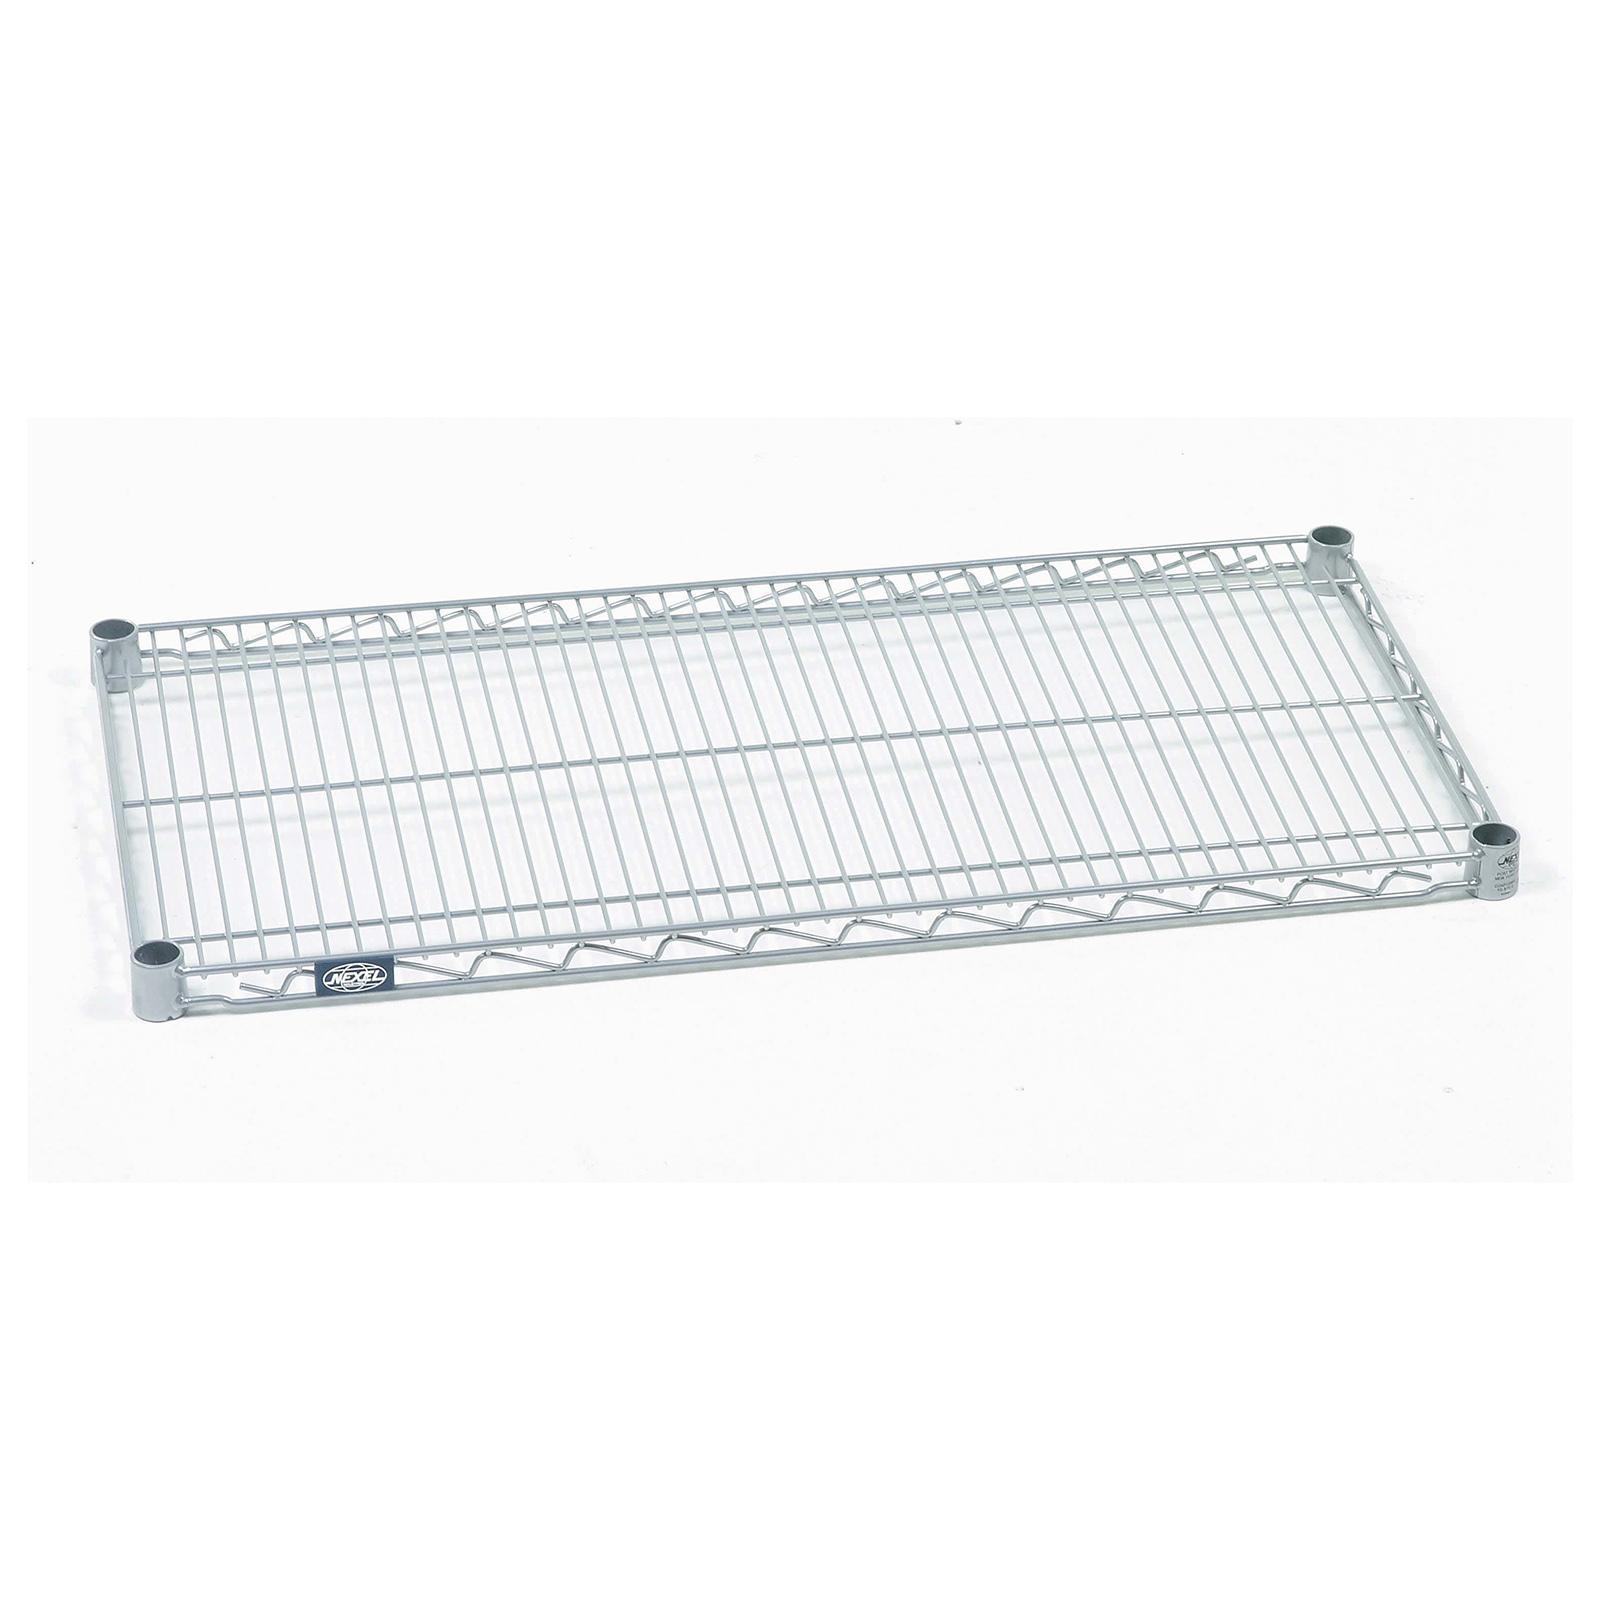 Nexel S1454EP wire shelves